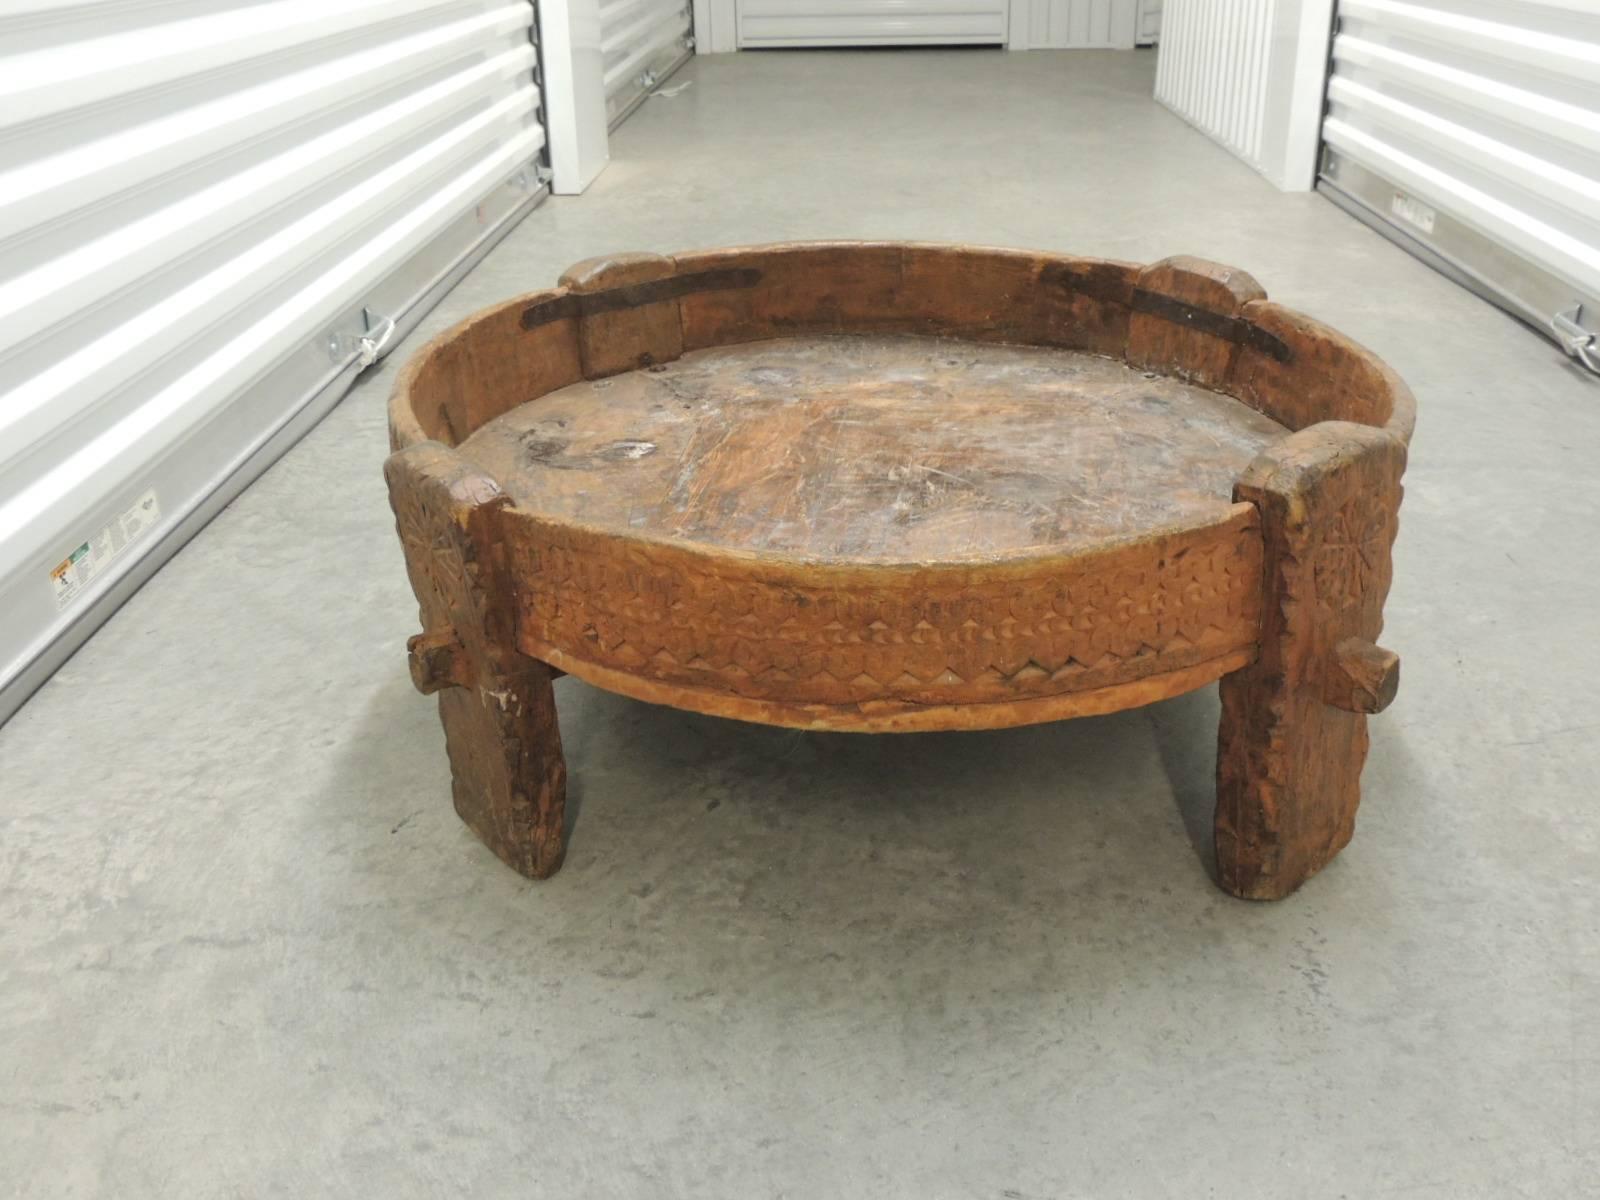 Moroccan Carved Wood Primitive Vintage Coffee Table At 1stdibs